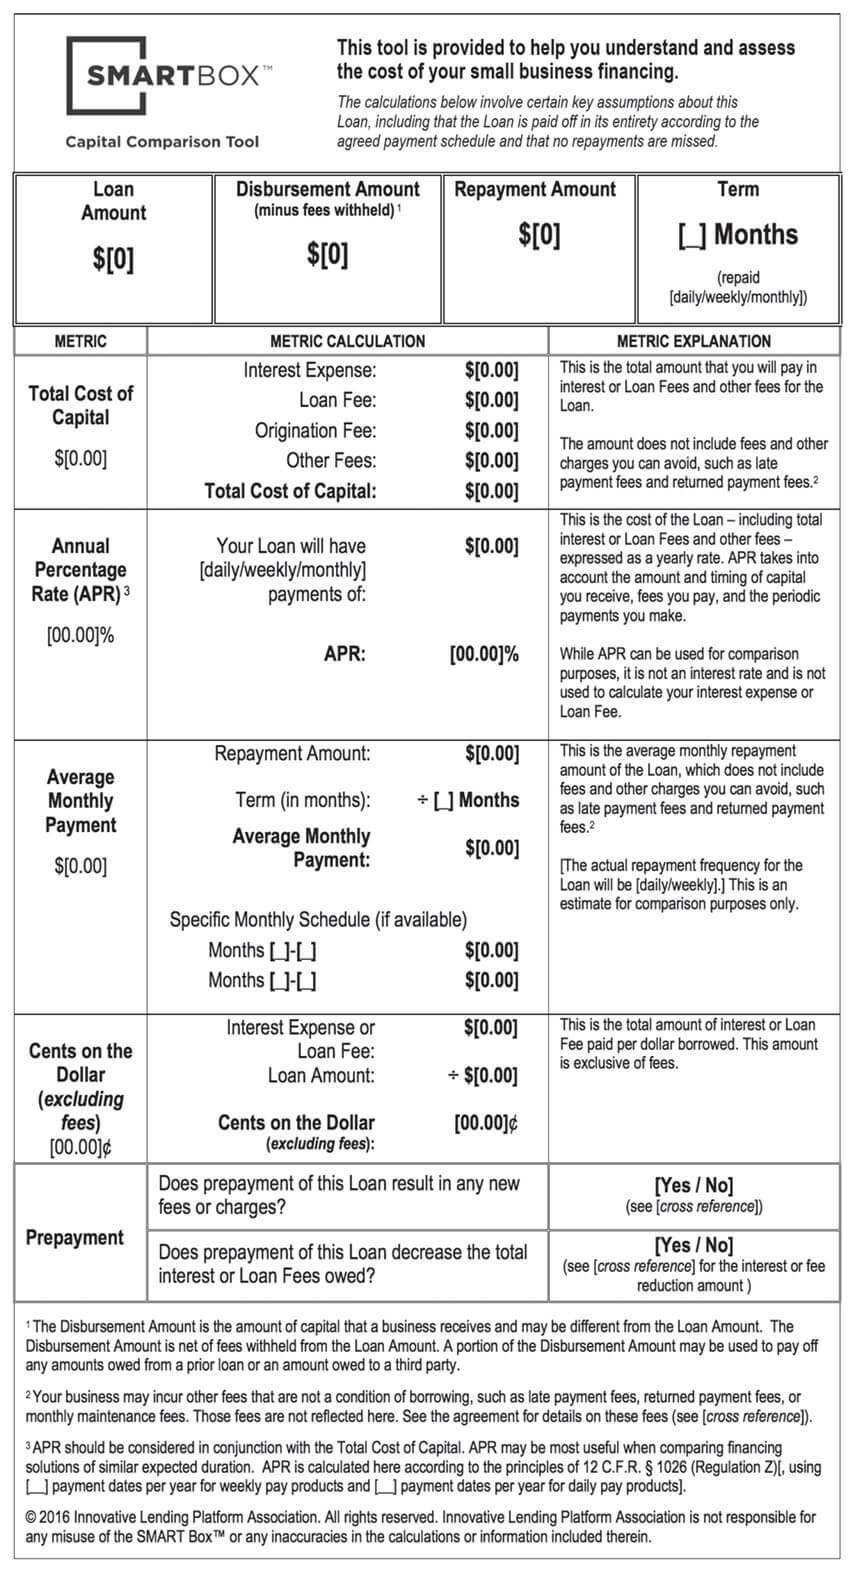 SMART Box for Term Loan